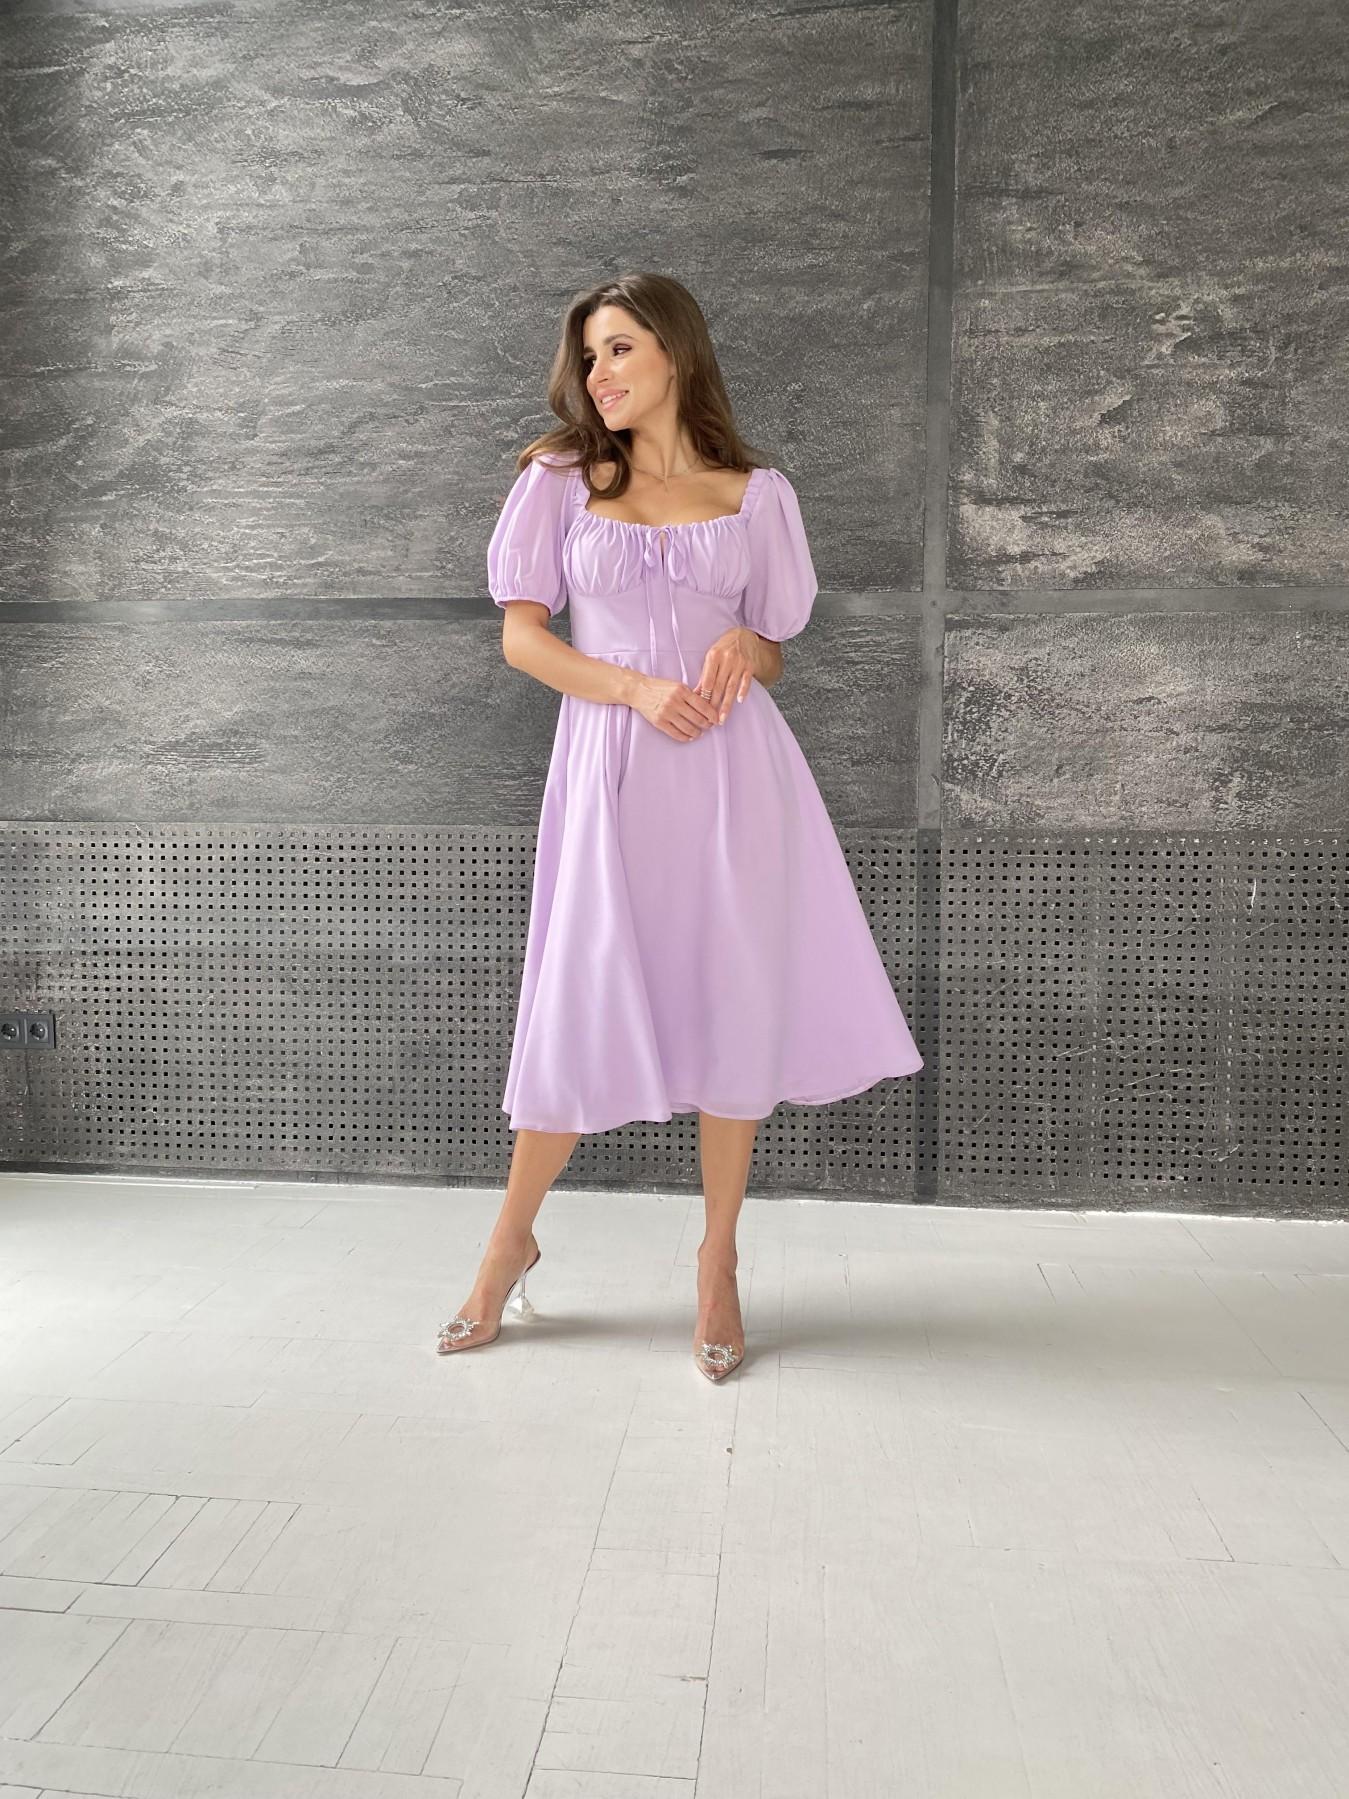 Кисес Миди платье из шифона креп 11443 АРТ. 48311 Цвет: Лаванда - фото 1, интернет магазин tm-modus.ru